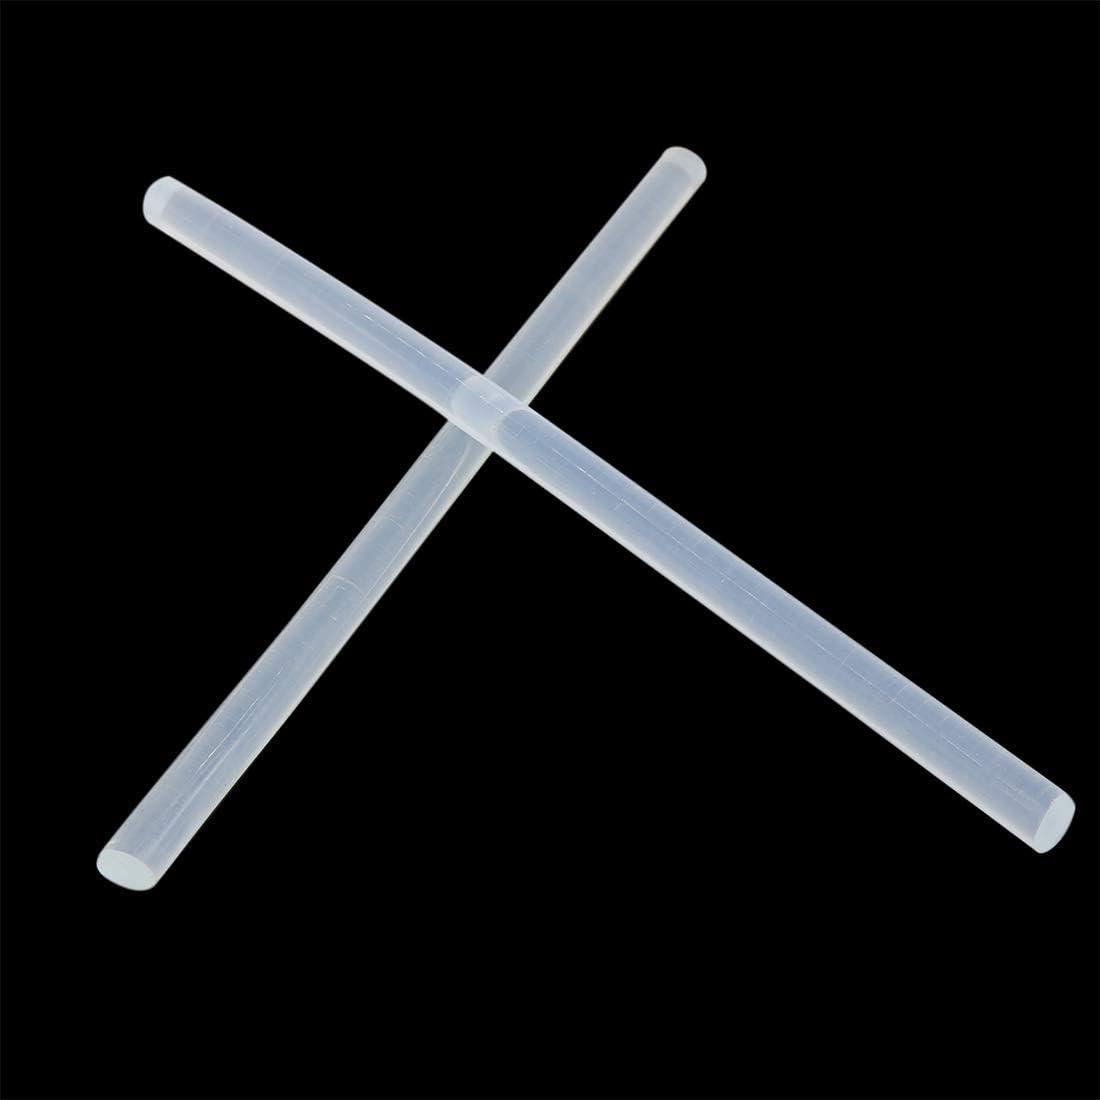 X AUTOHAUX 10 Pcs 7mm X 150mm Hot Glue Sticks Auto Body Paintless Dent Removal Repair for Car